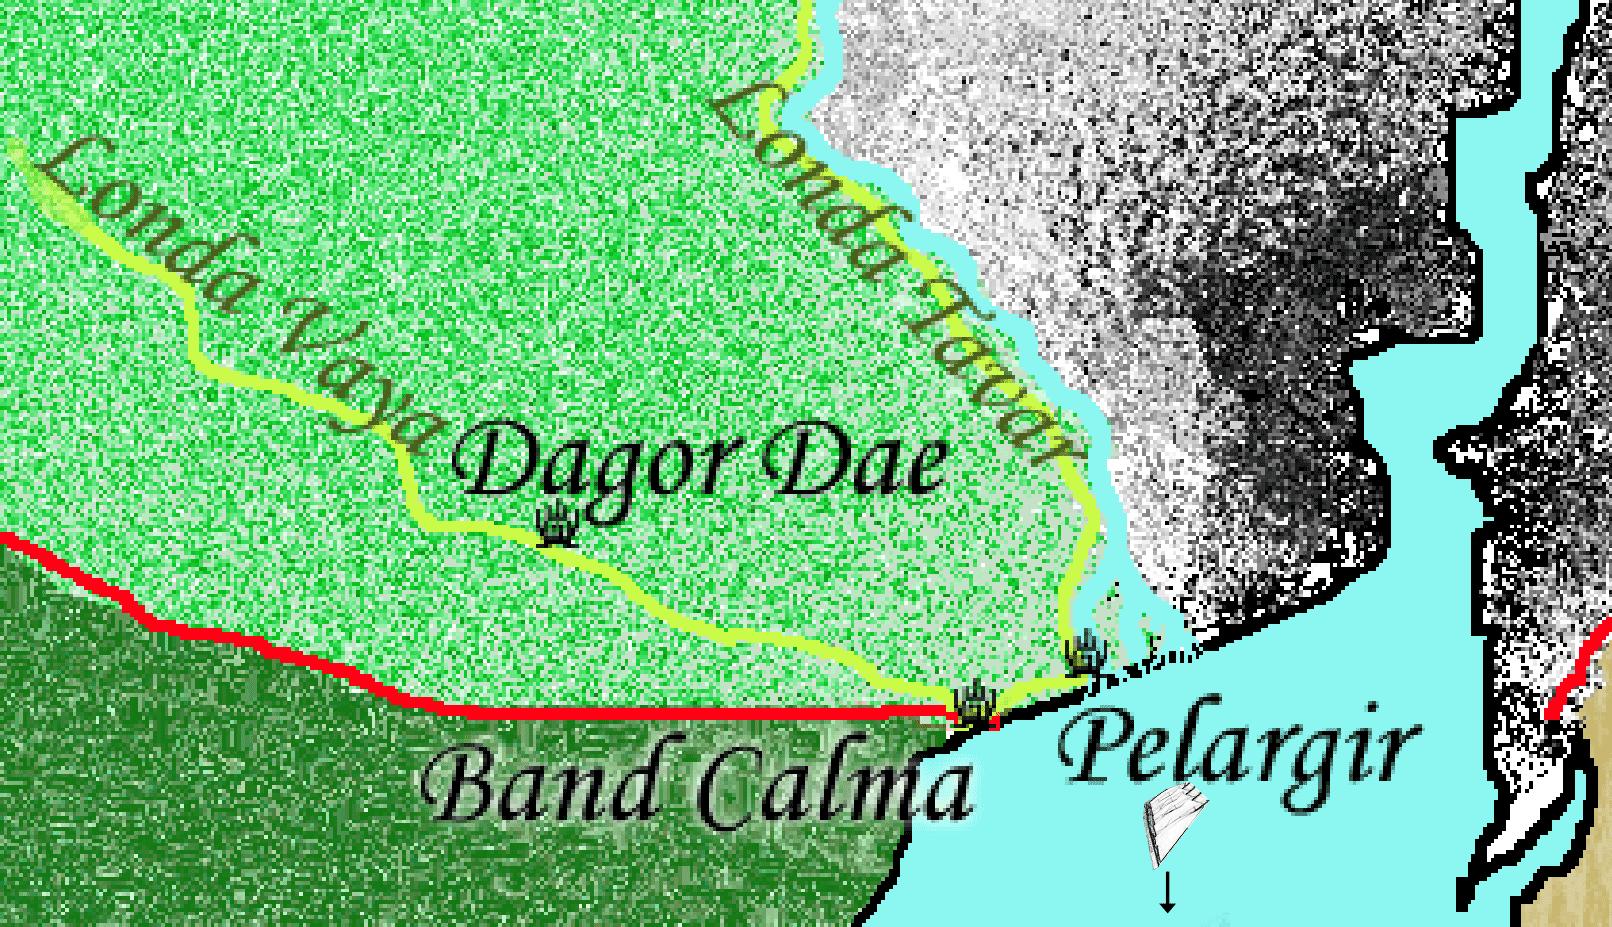 band-calma.png